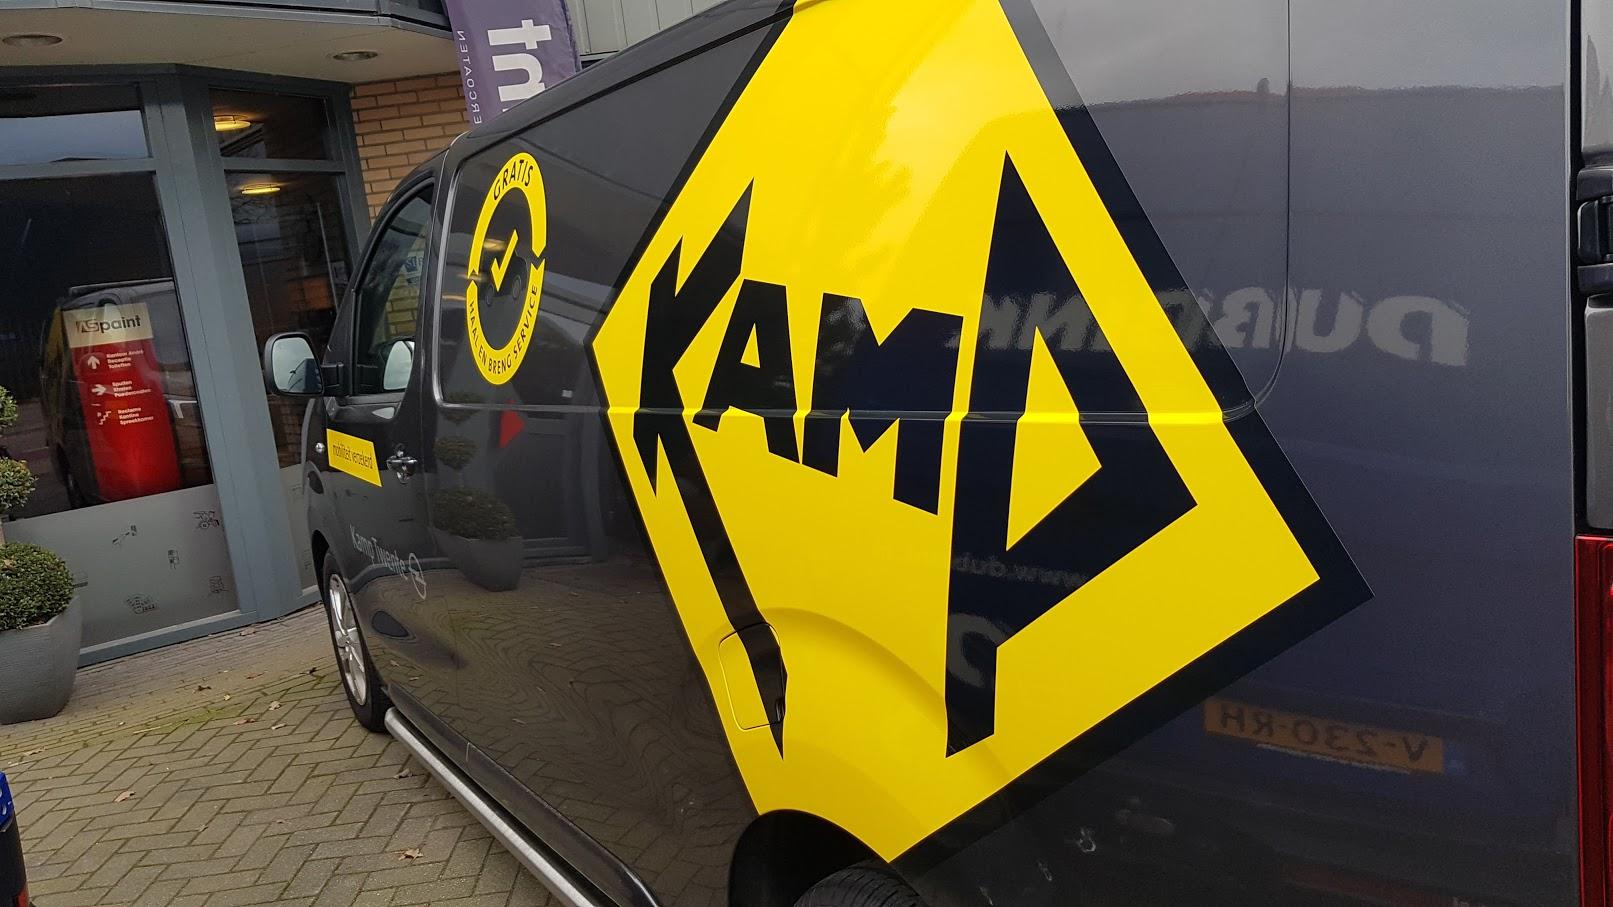 kamp, kamp Twente, Opel, Opel Kamp, AS, AS Paint, Vriezenveen, Vivaro, Servicewagen, belettering, sign, reclame